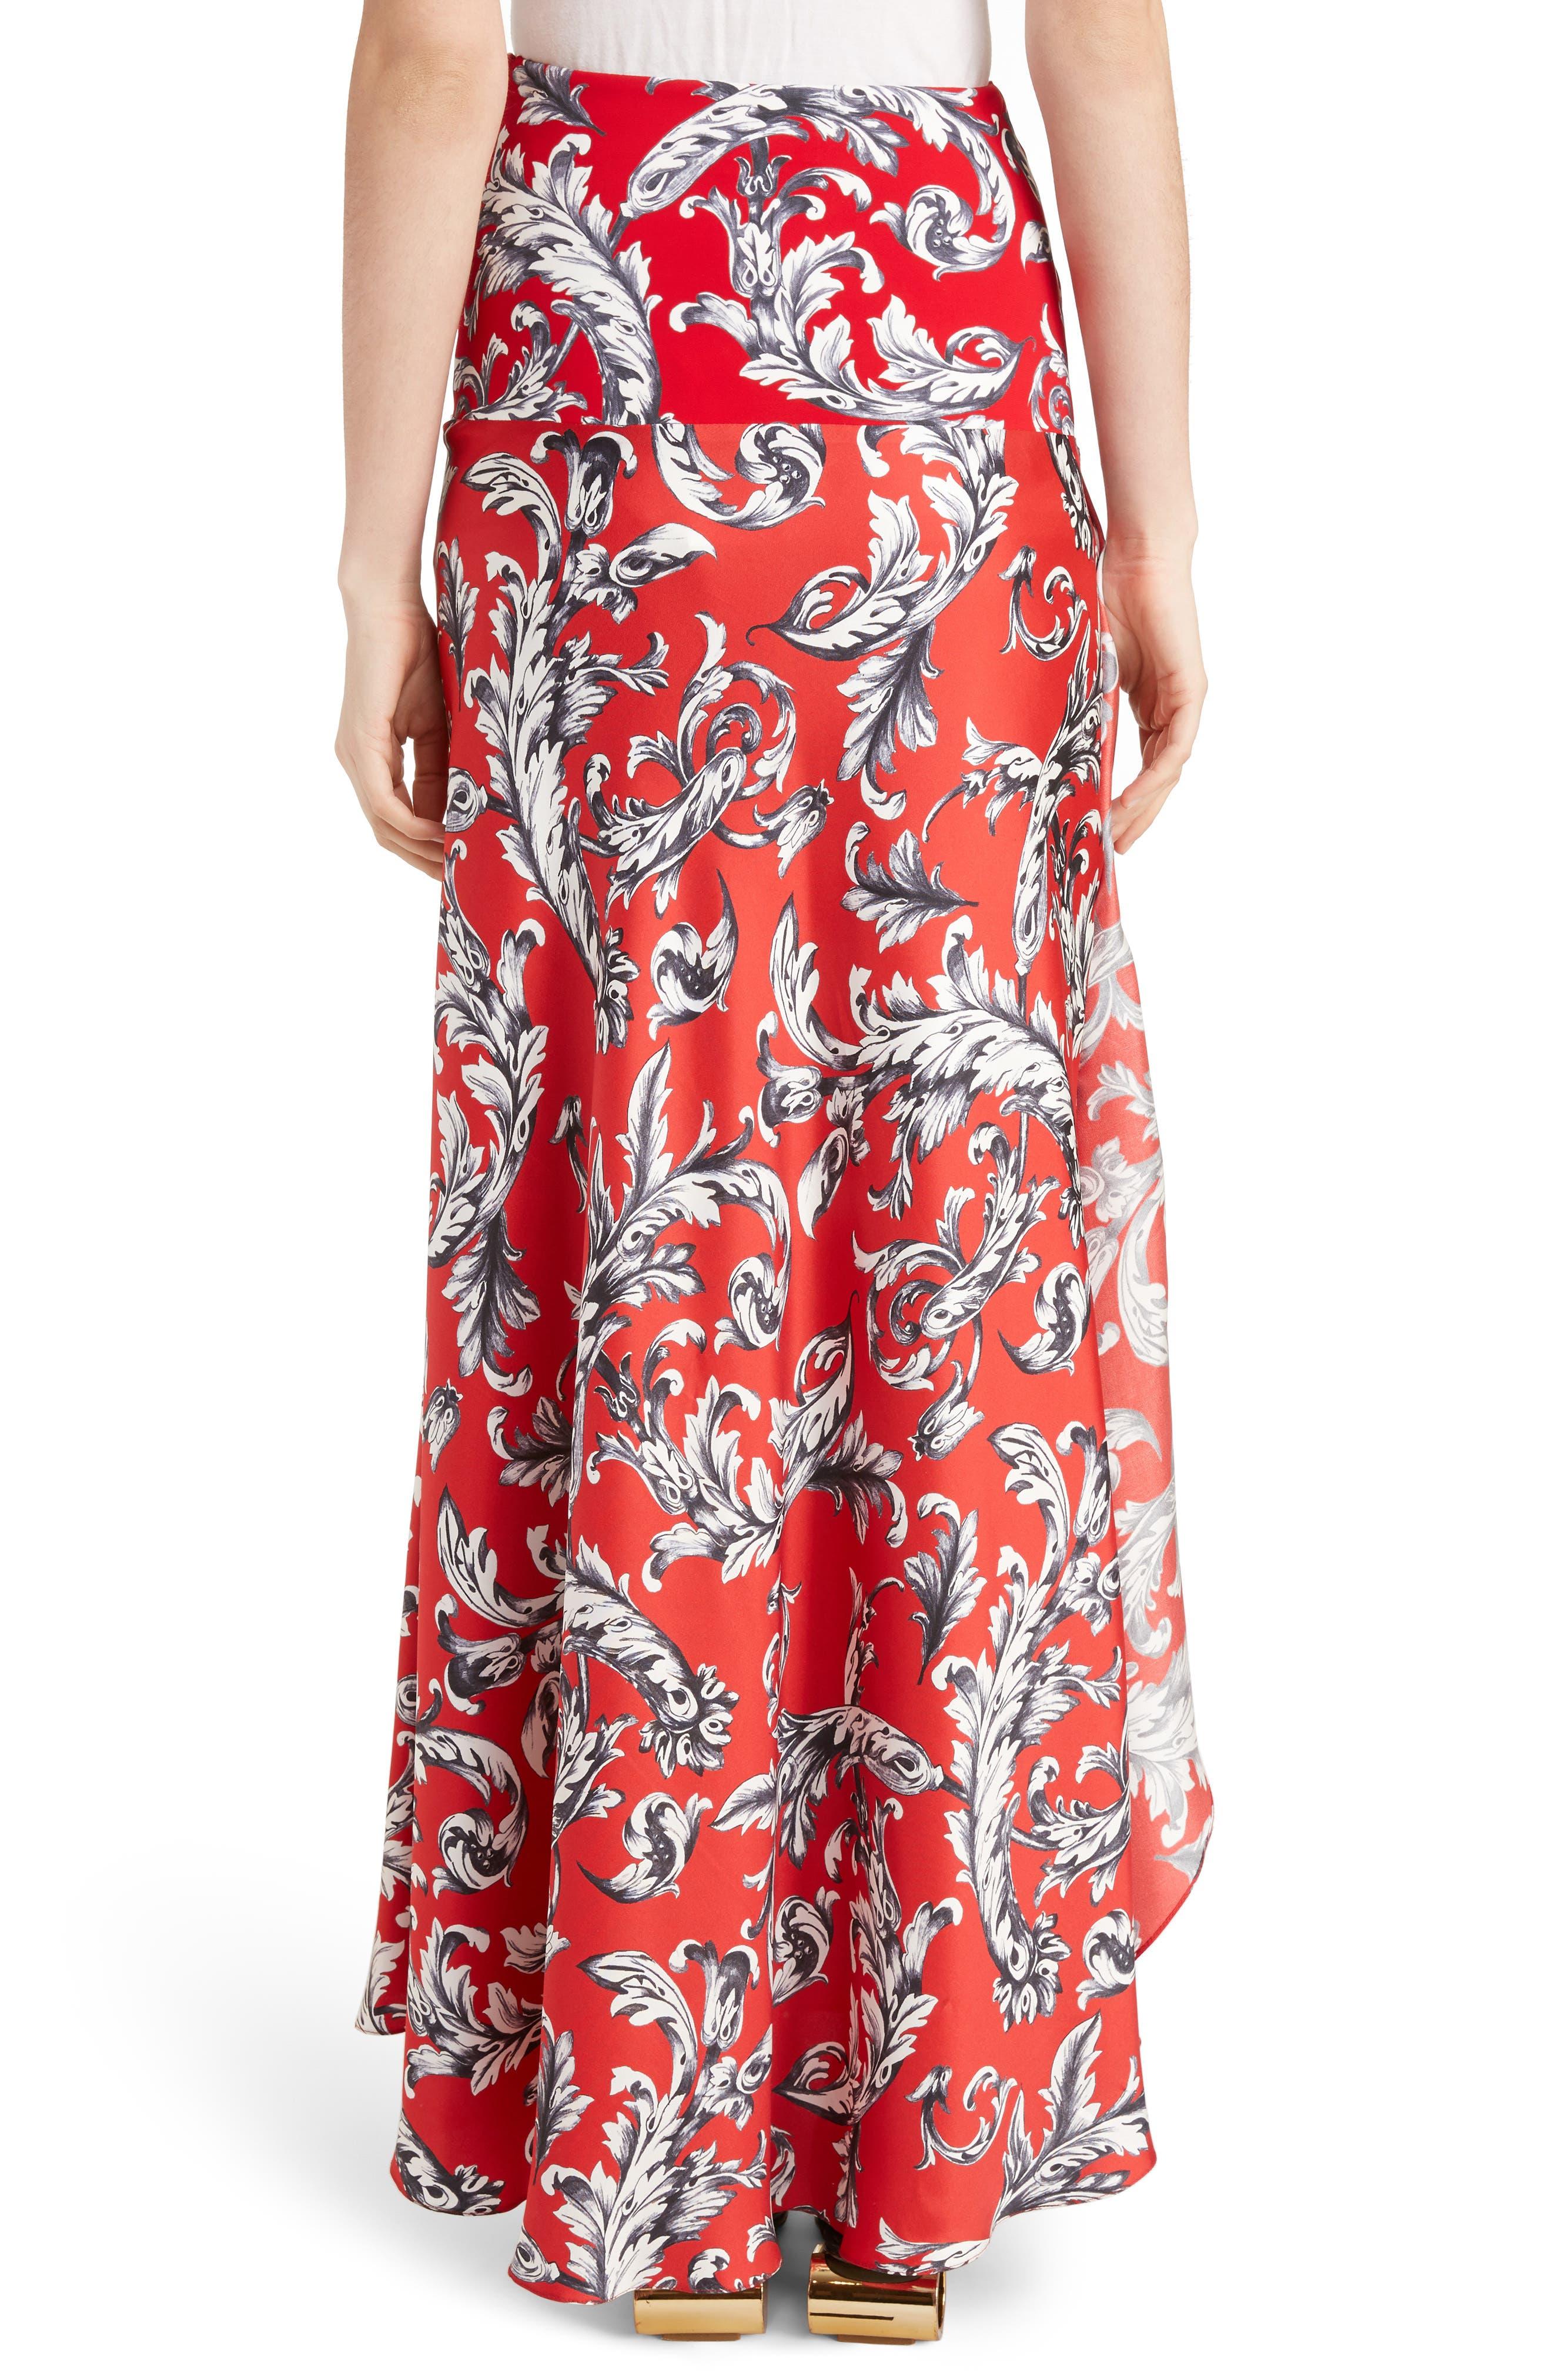 J.W.ANDERSON Filigree Print Asymmetrical Maxi Skirt,                             Alternate thumbnail 2, color,